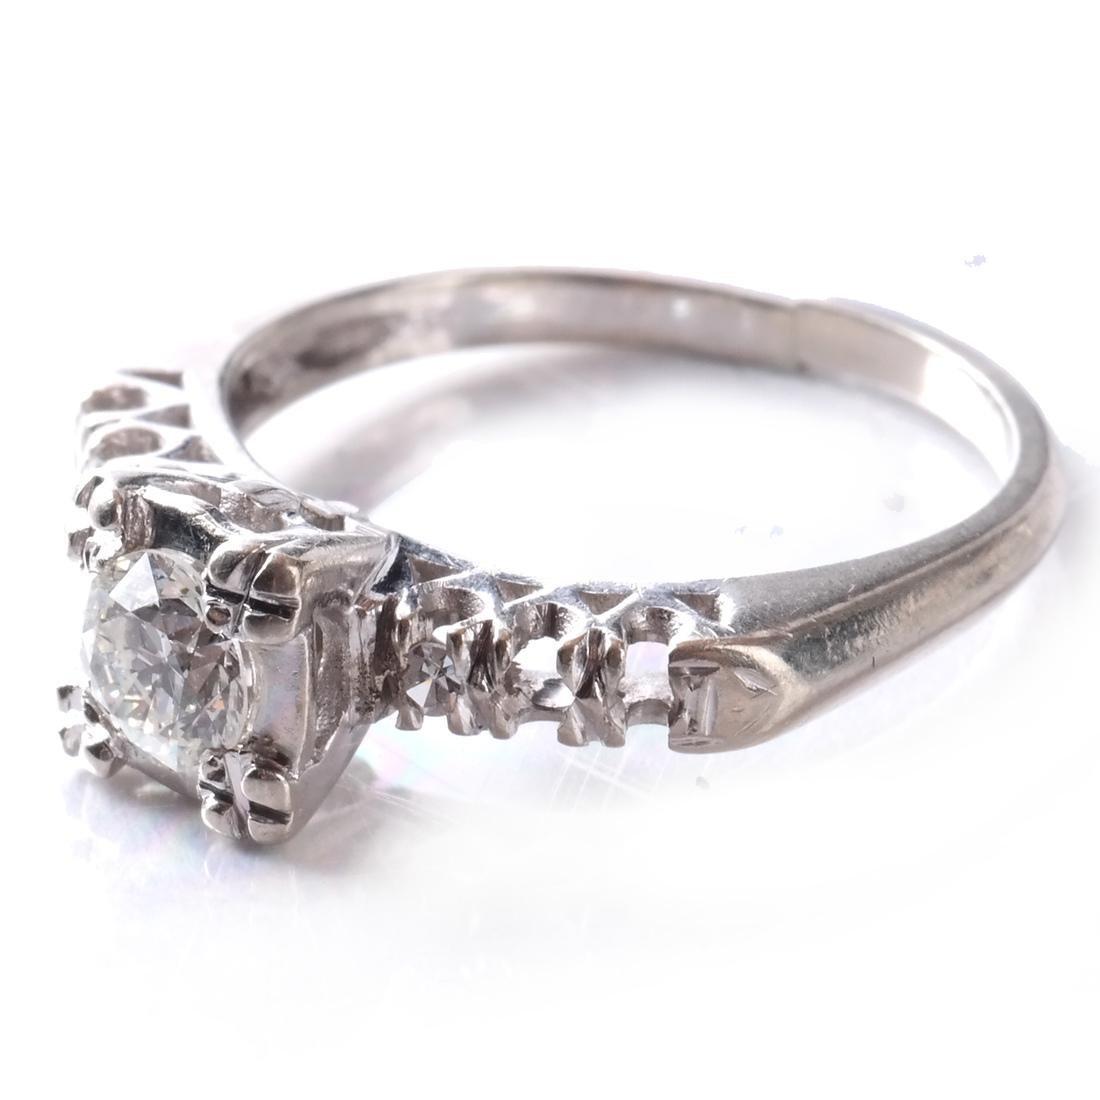 14k Diamond Ring - 3